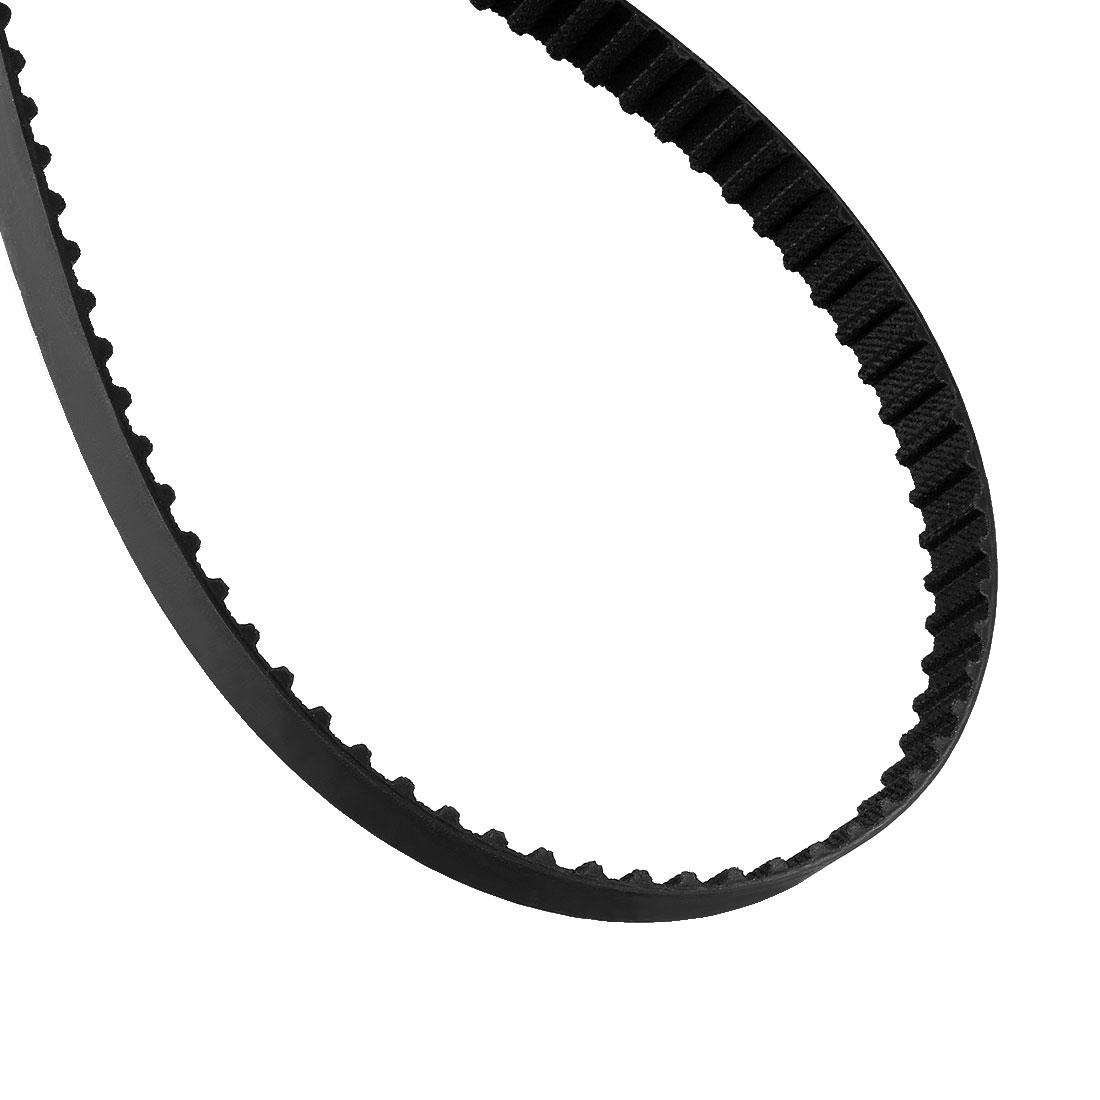 434XL 217 Teeth 10mm Width 5.08mm Pitch Stepper Motor Rubber Timing Belt Black